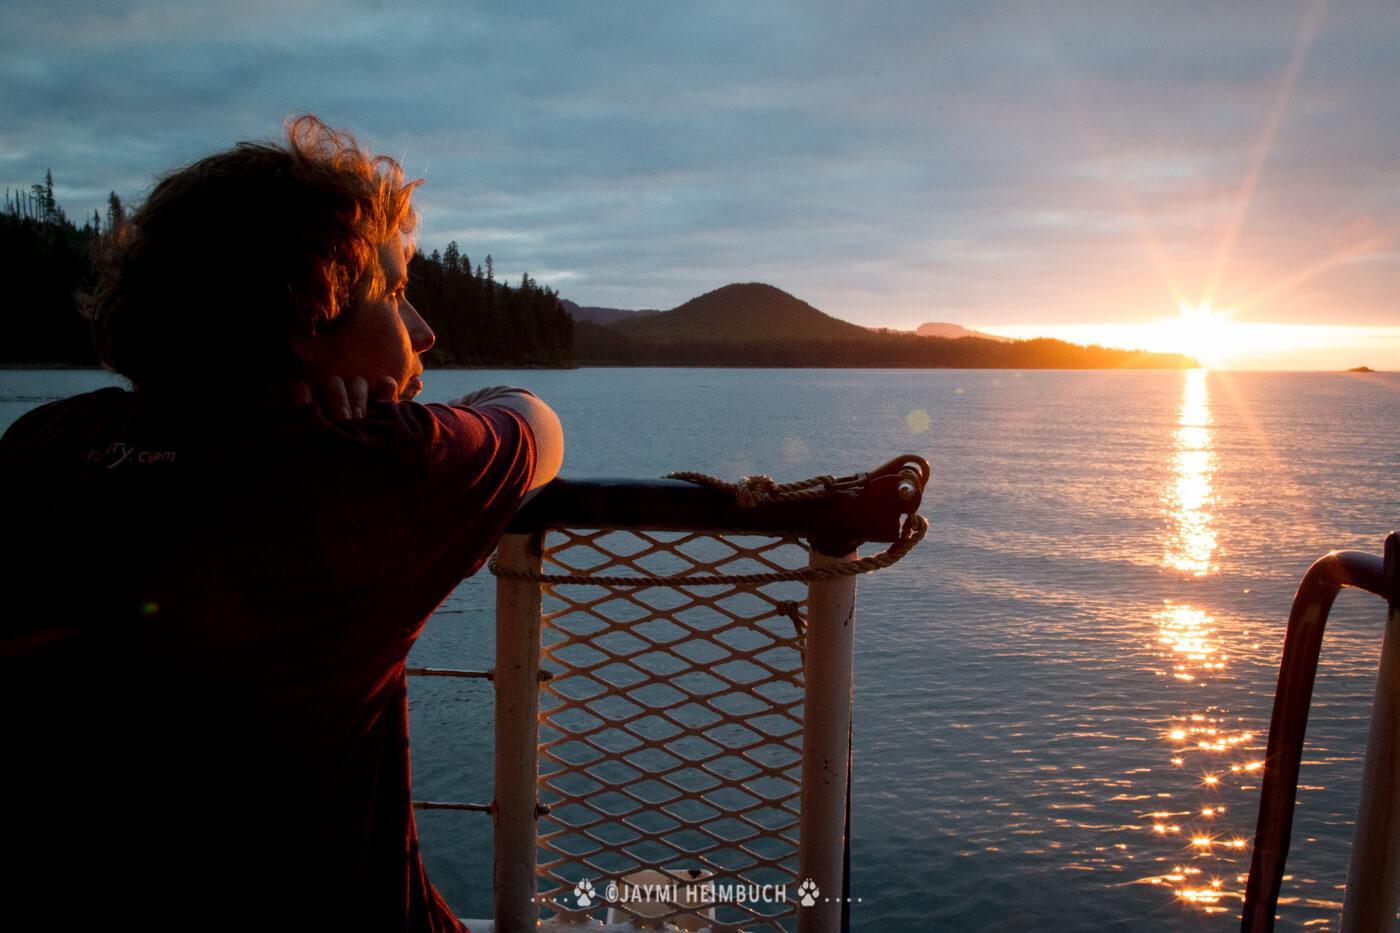 Enjoying one of many breathtaking Alaskan sunsets from the ship's deck. © Jaymi Heimbuch